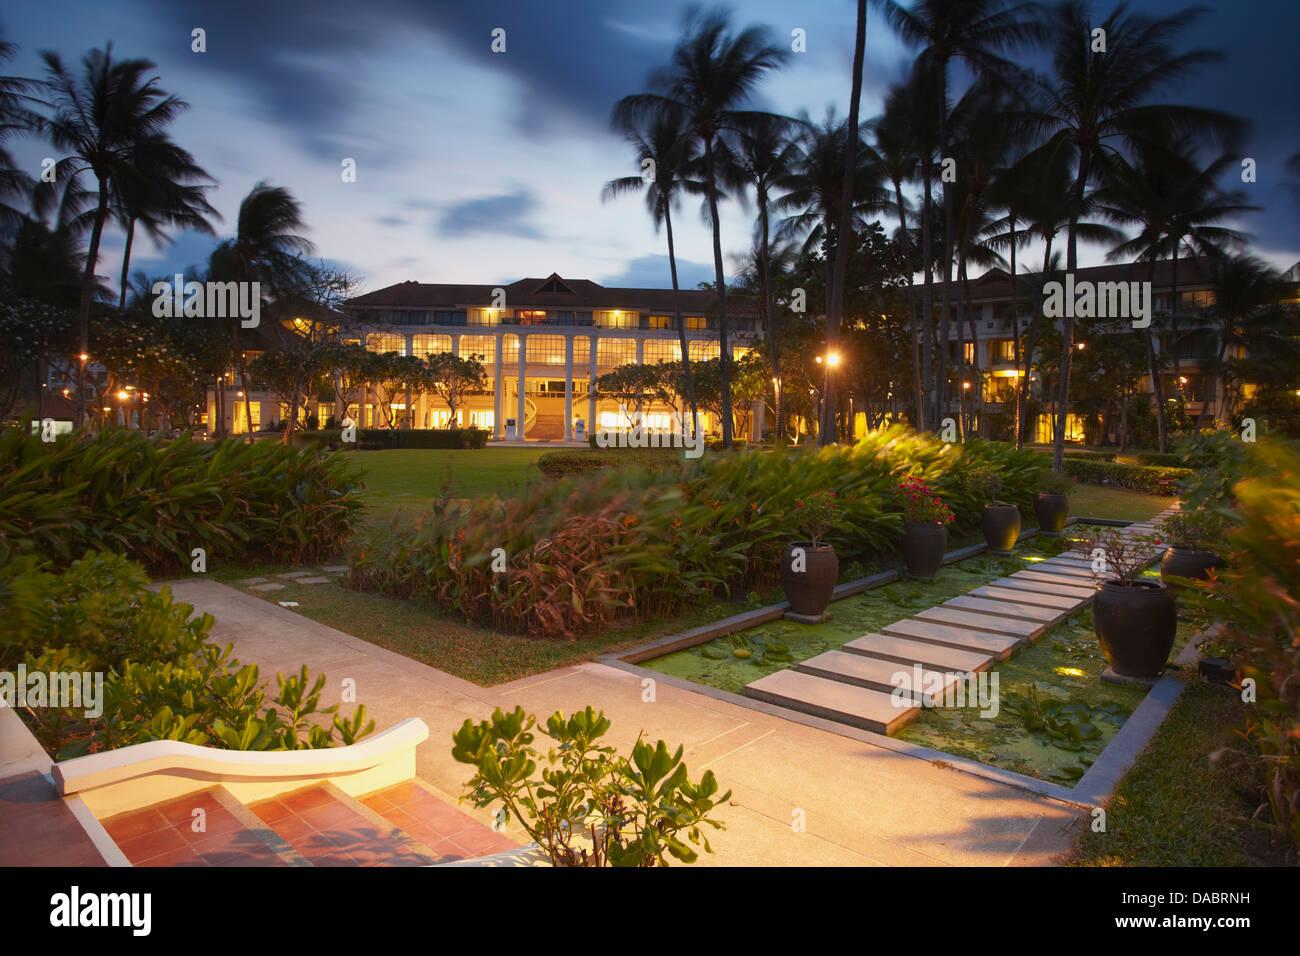 Centara Grand Beach Resort, Chaweng Beach, Ko Samui, Thailand, Southeast Asia, Asia - Stock Image